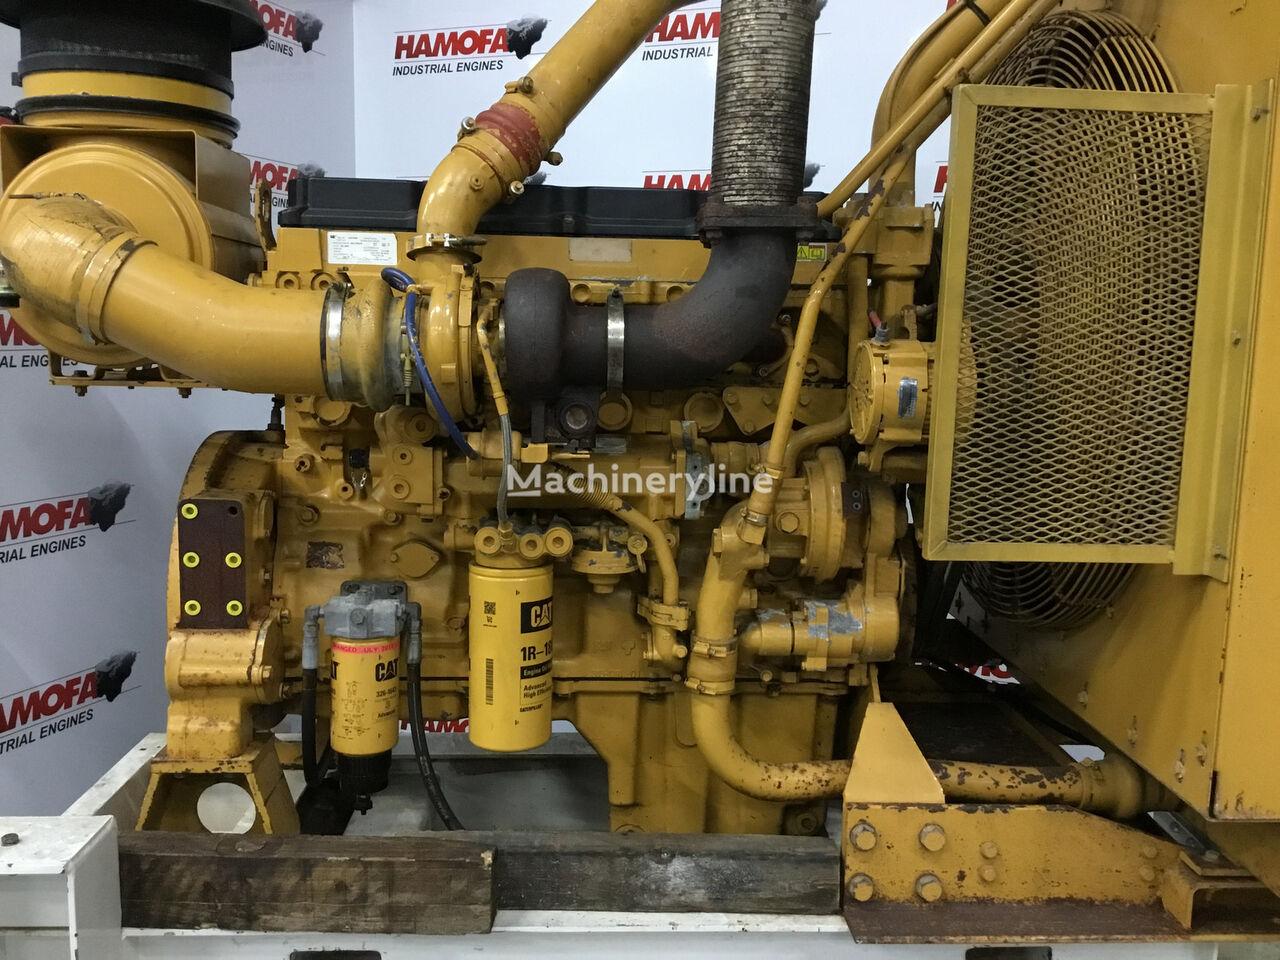 CATERPILLAR C13 LGK-2413804 USED engine for wheel loader